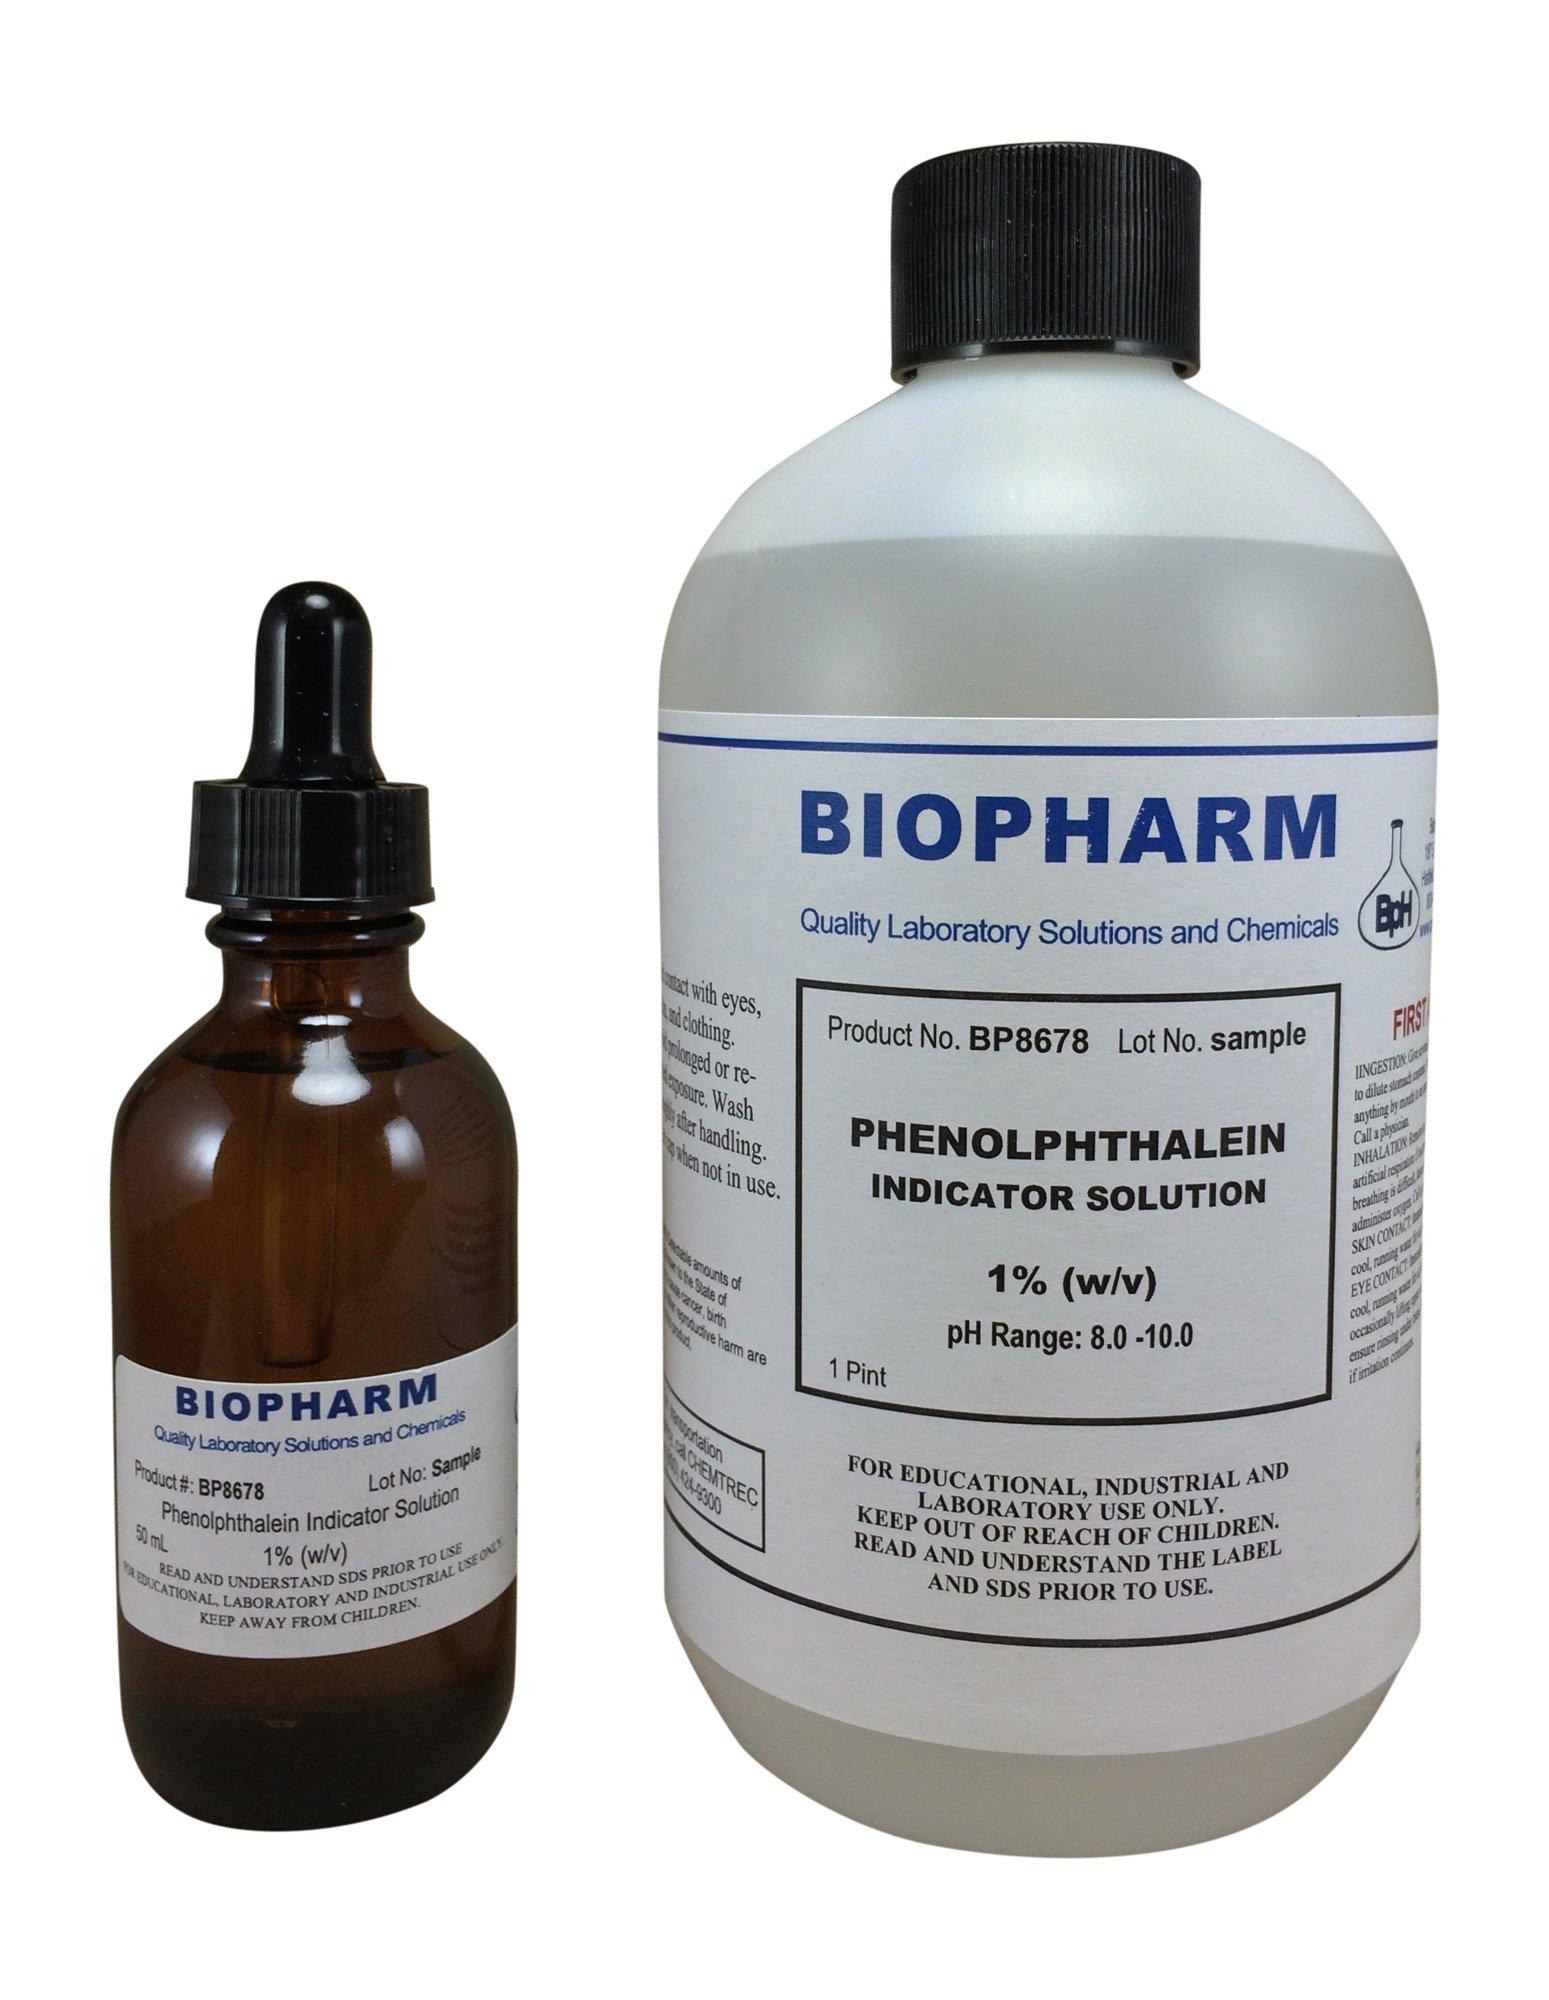 Phenolphthalein Indicator 1% Solution 500 ml (16 oz) Bottle plus 1 Dropper Bottle (2 oz) containing 50 ml of Solution